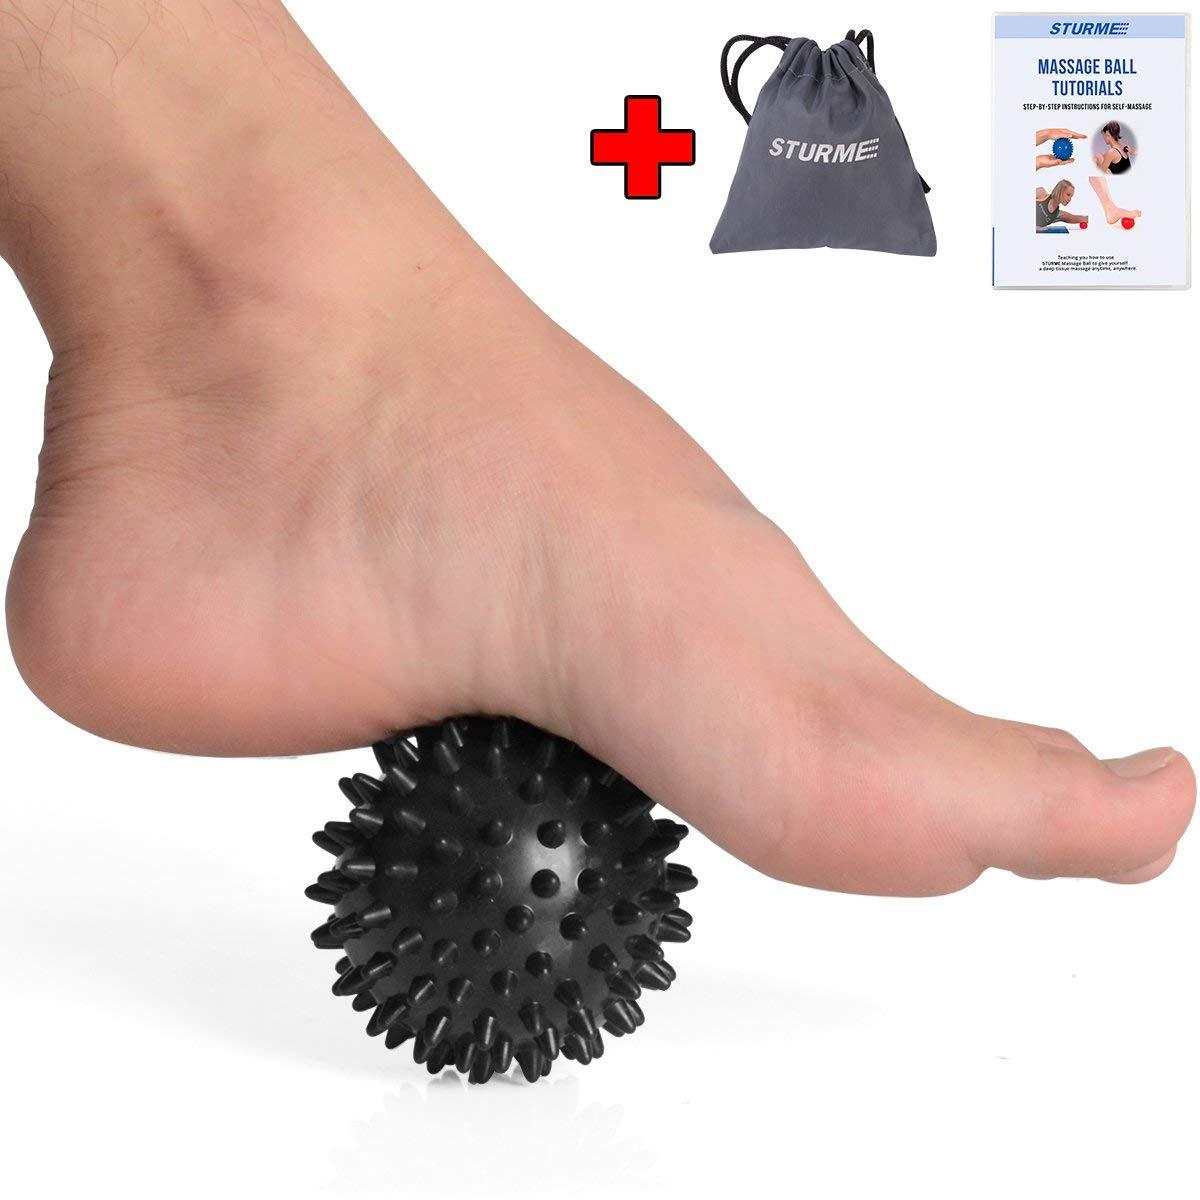 Massage Ball on Amazon $5.99-$6.99 AC w/ Free Prime Shipping